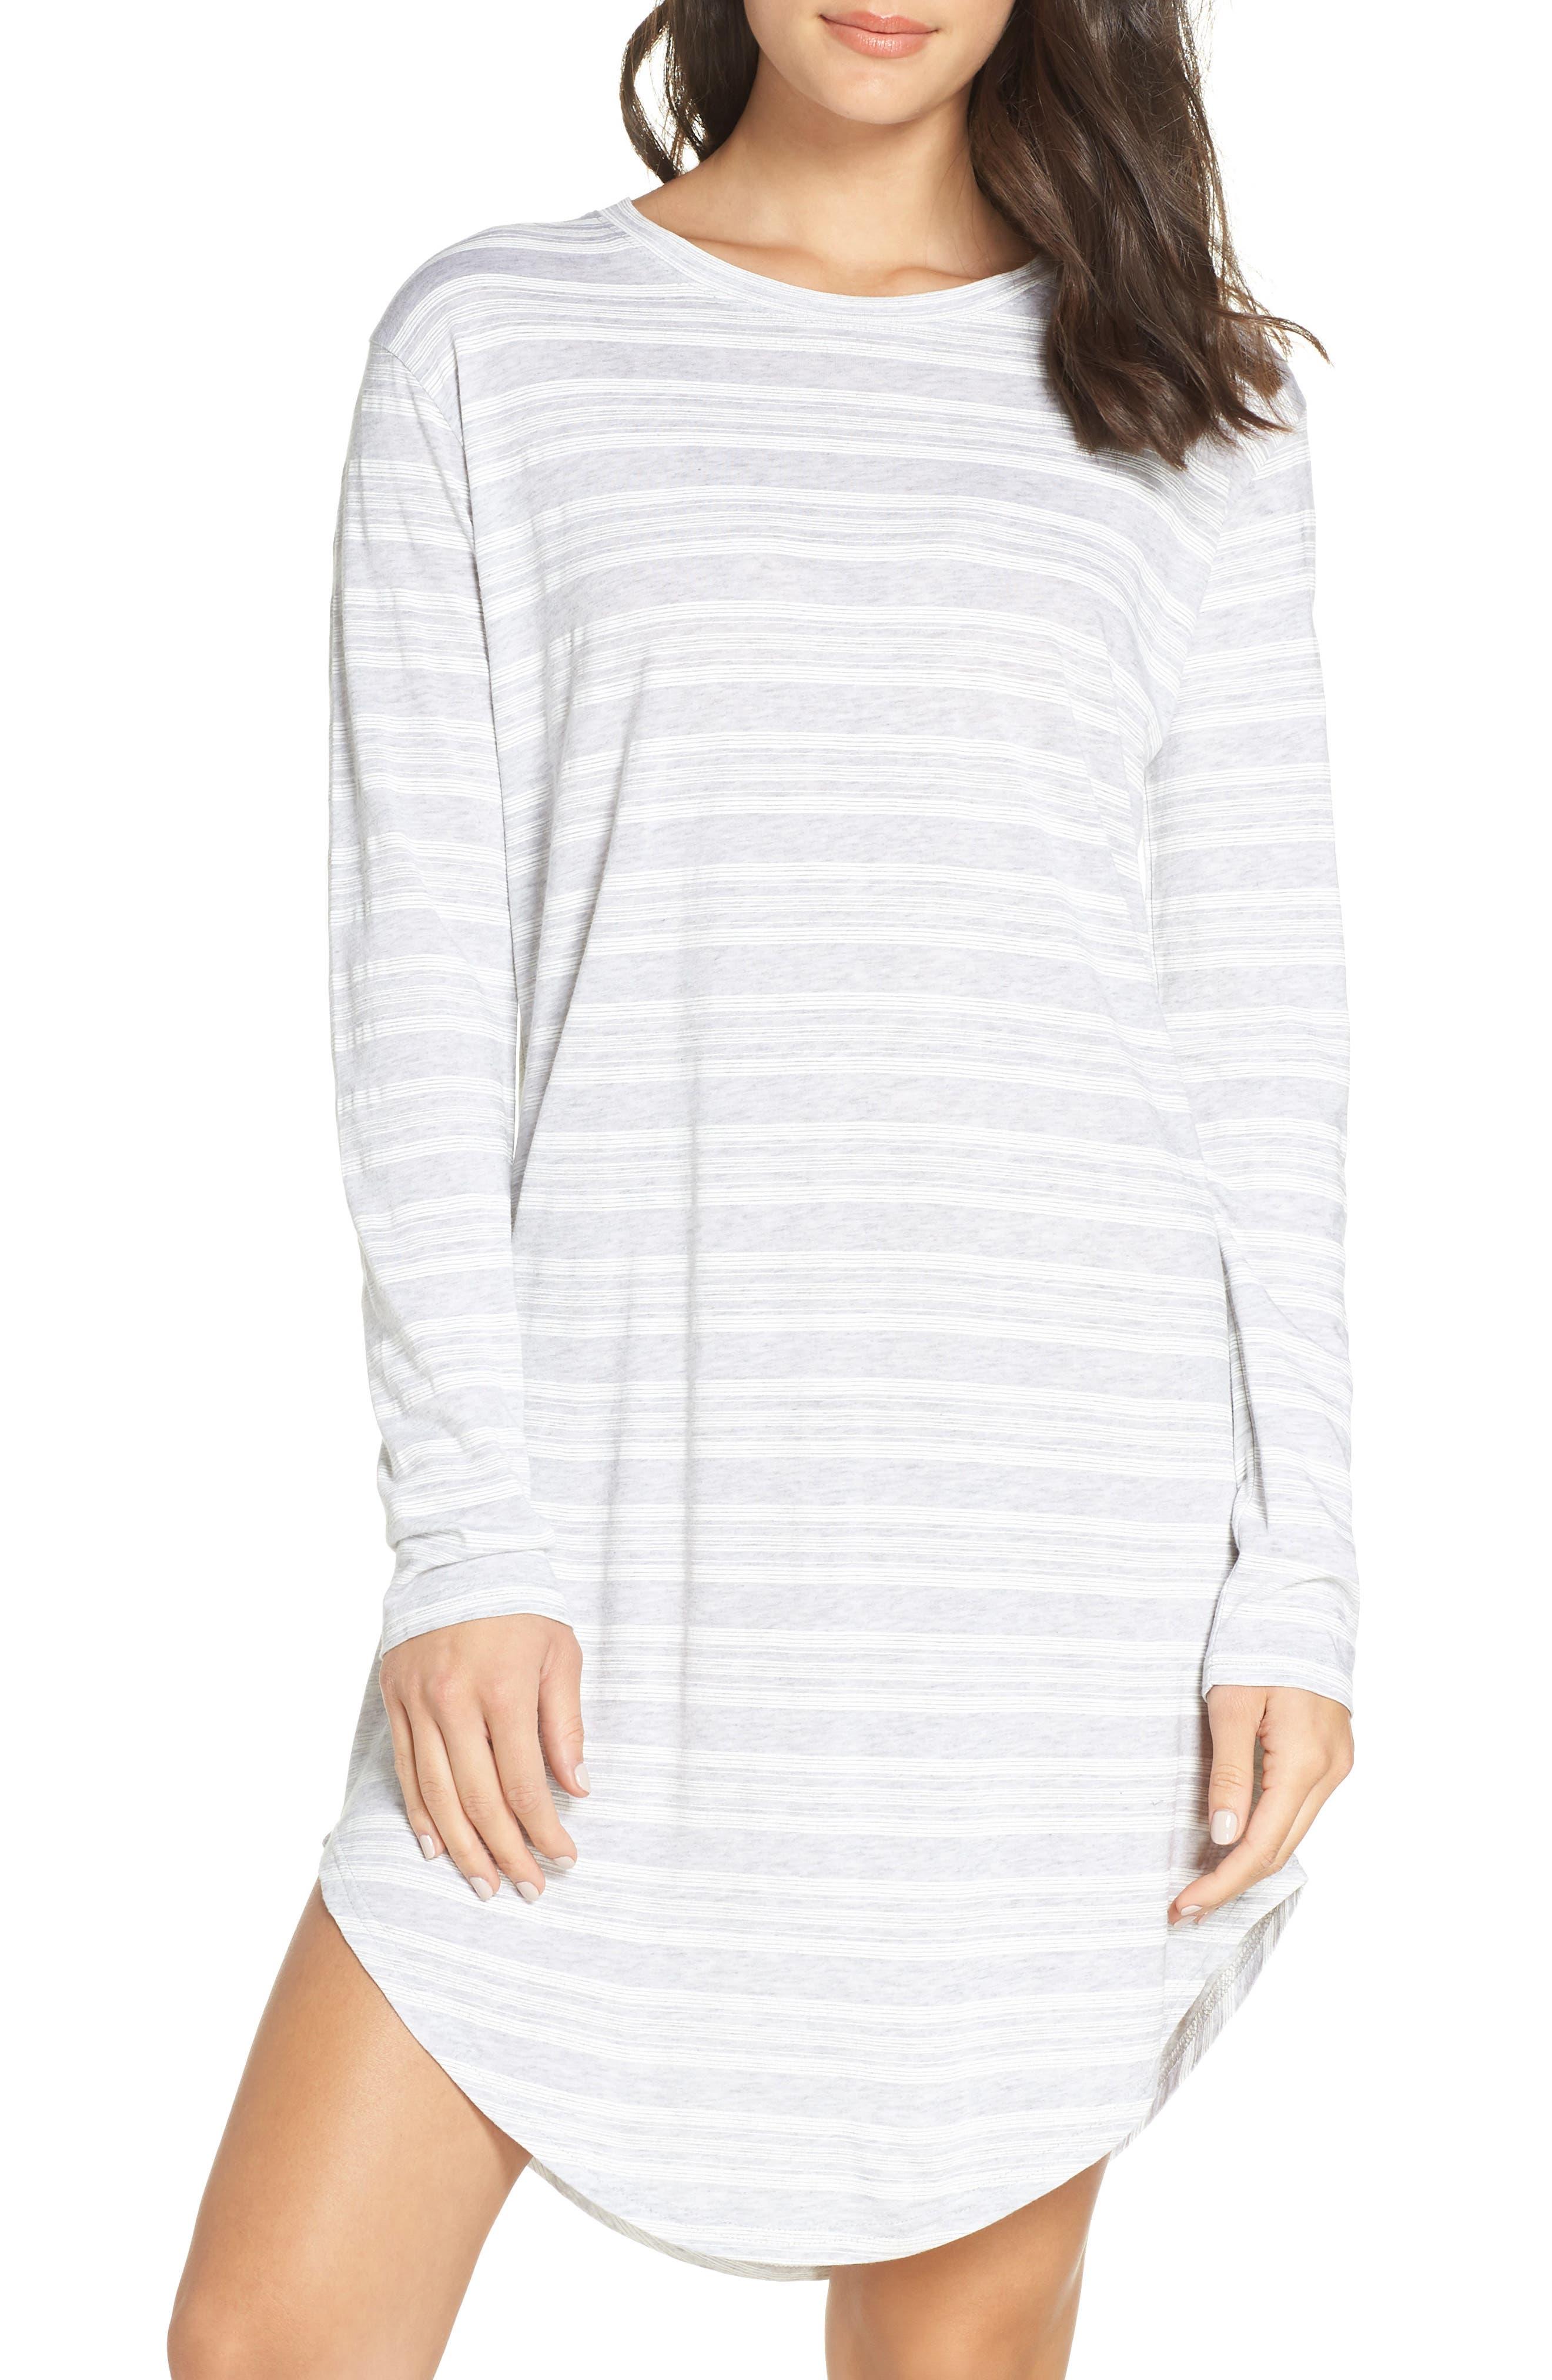 Chalmers Wednesday Sleep Shirt, Grey